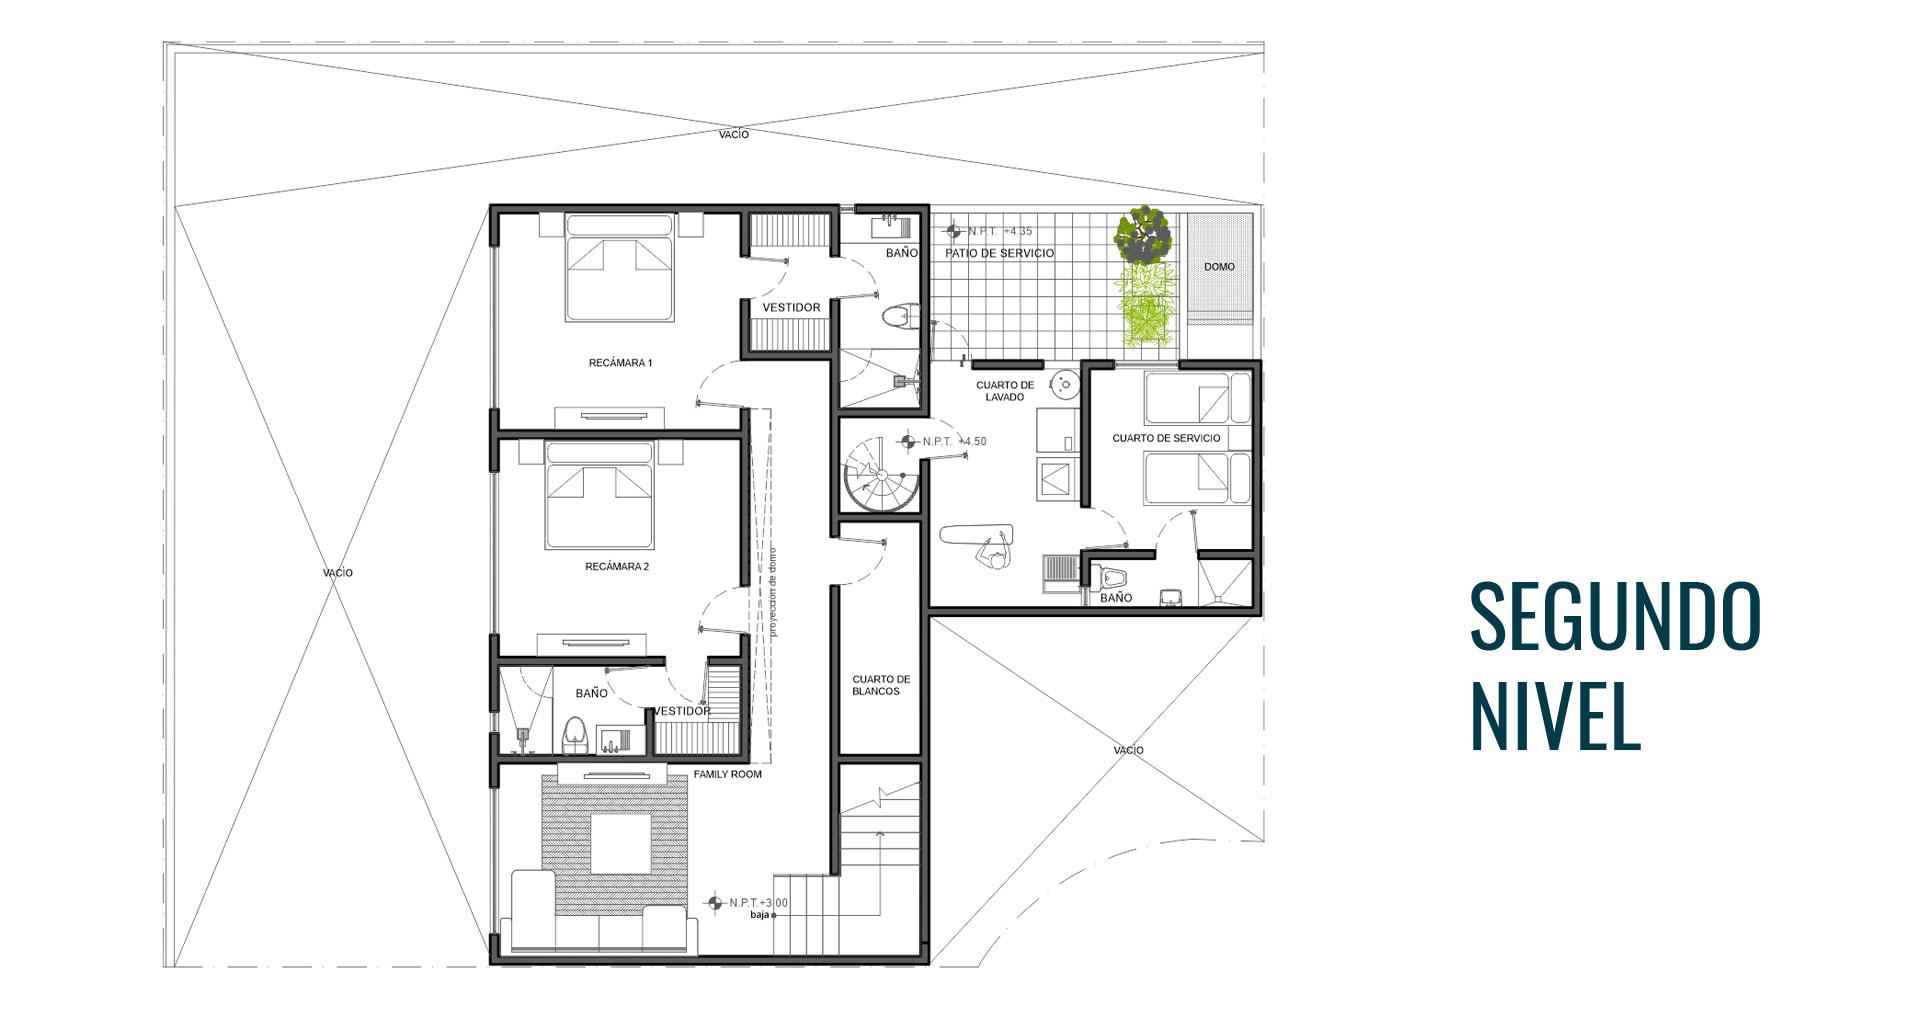 Margaritas 339 residencial Mexihom Residencia 5 segundo nivel